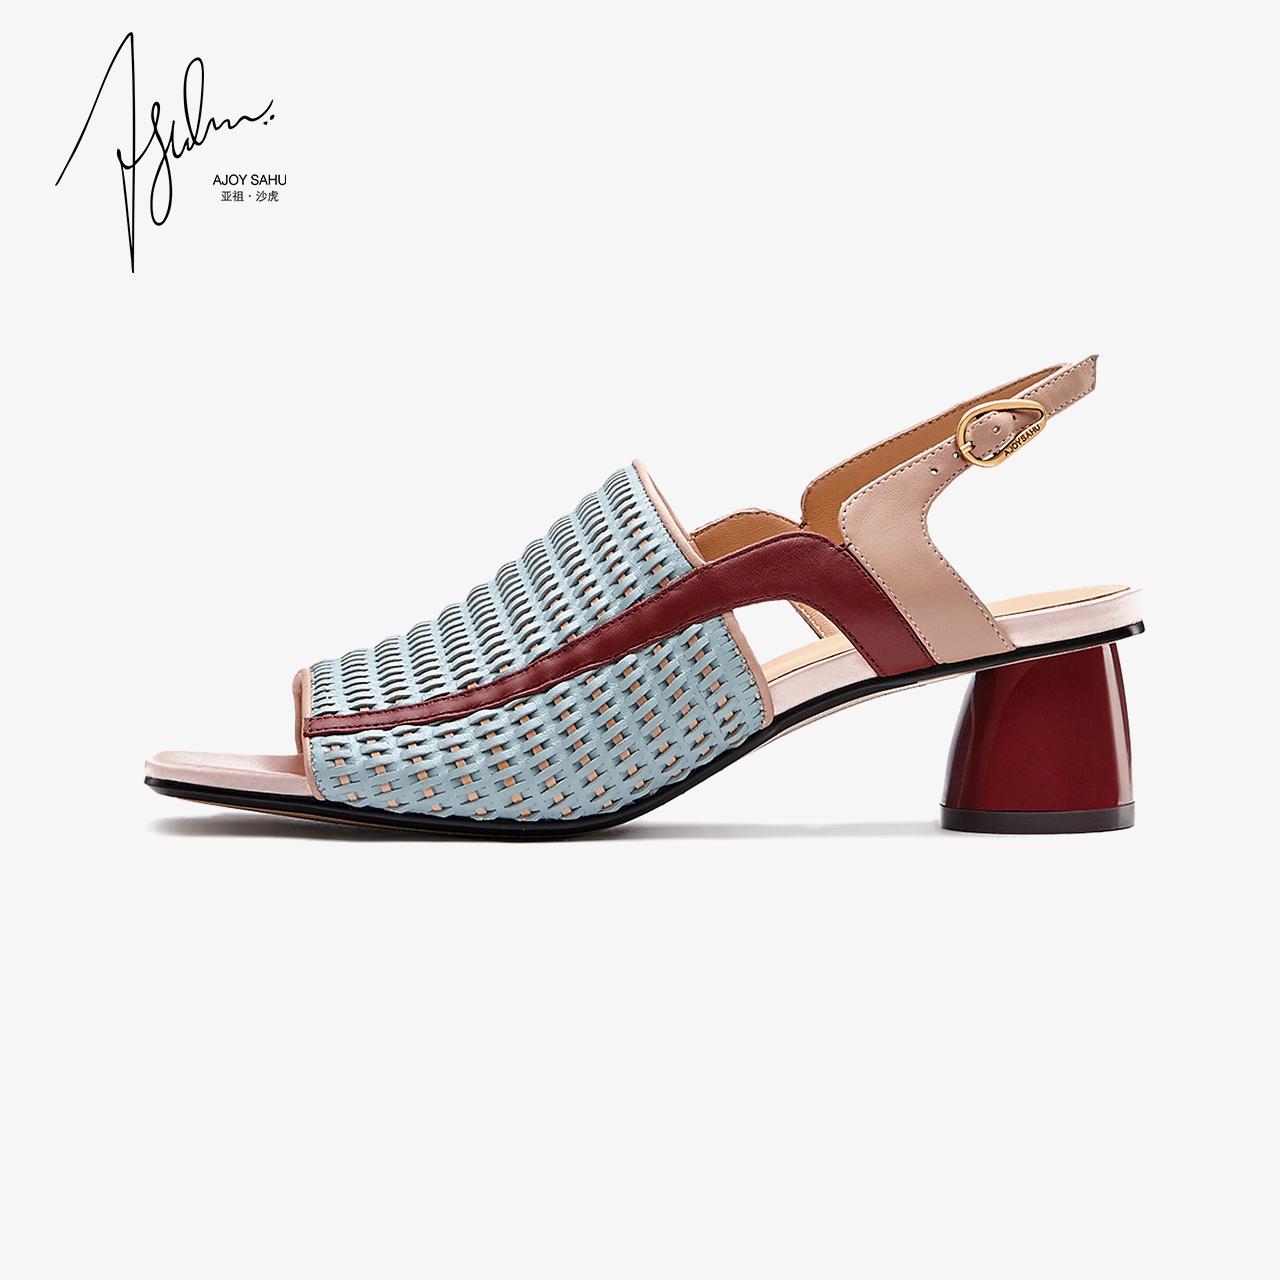 AJOY SAHU2018新款镂空女鞋复古编织凉鞋女高跟粗跟露趾凉鞋女鞋